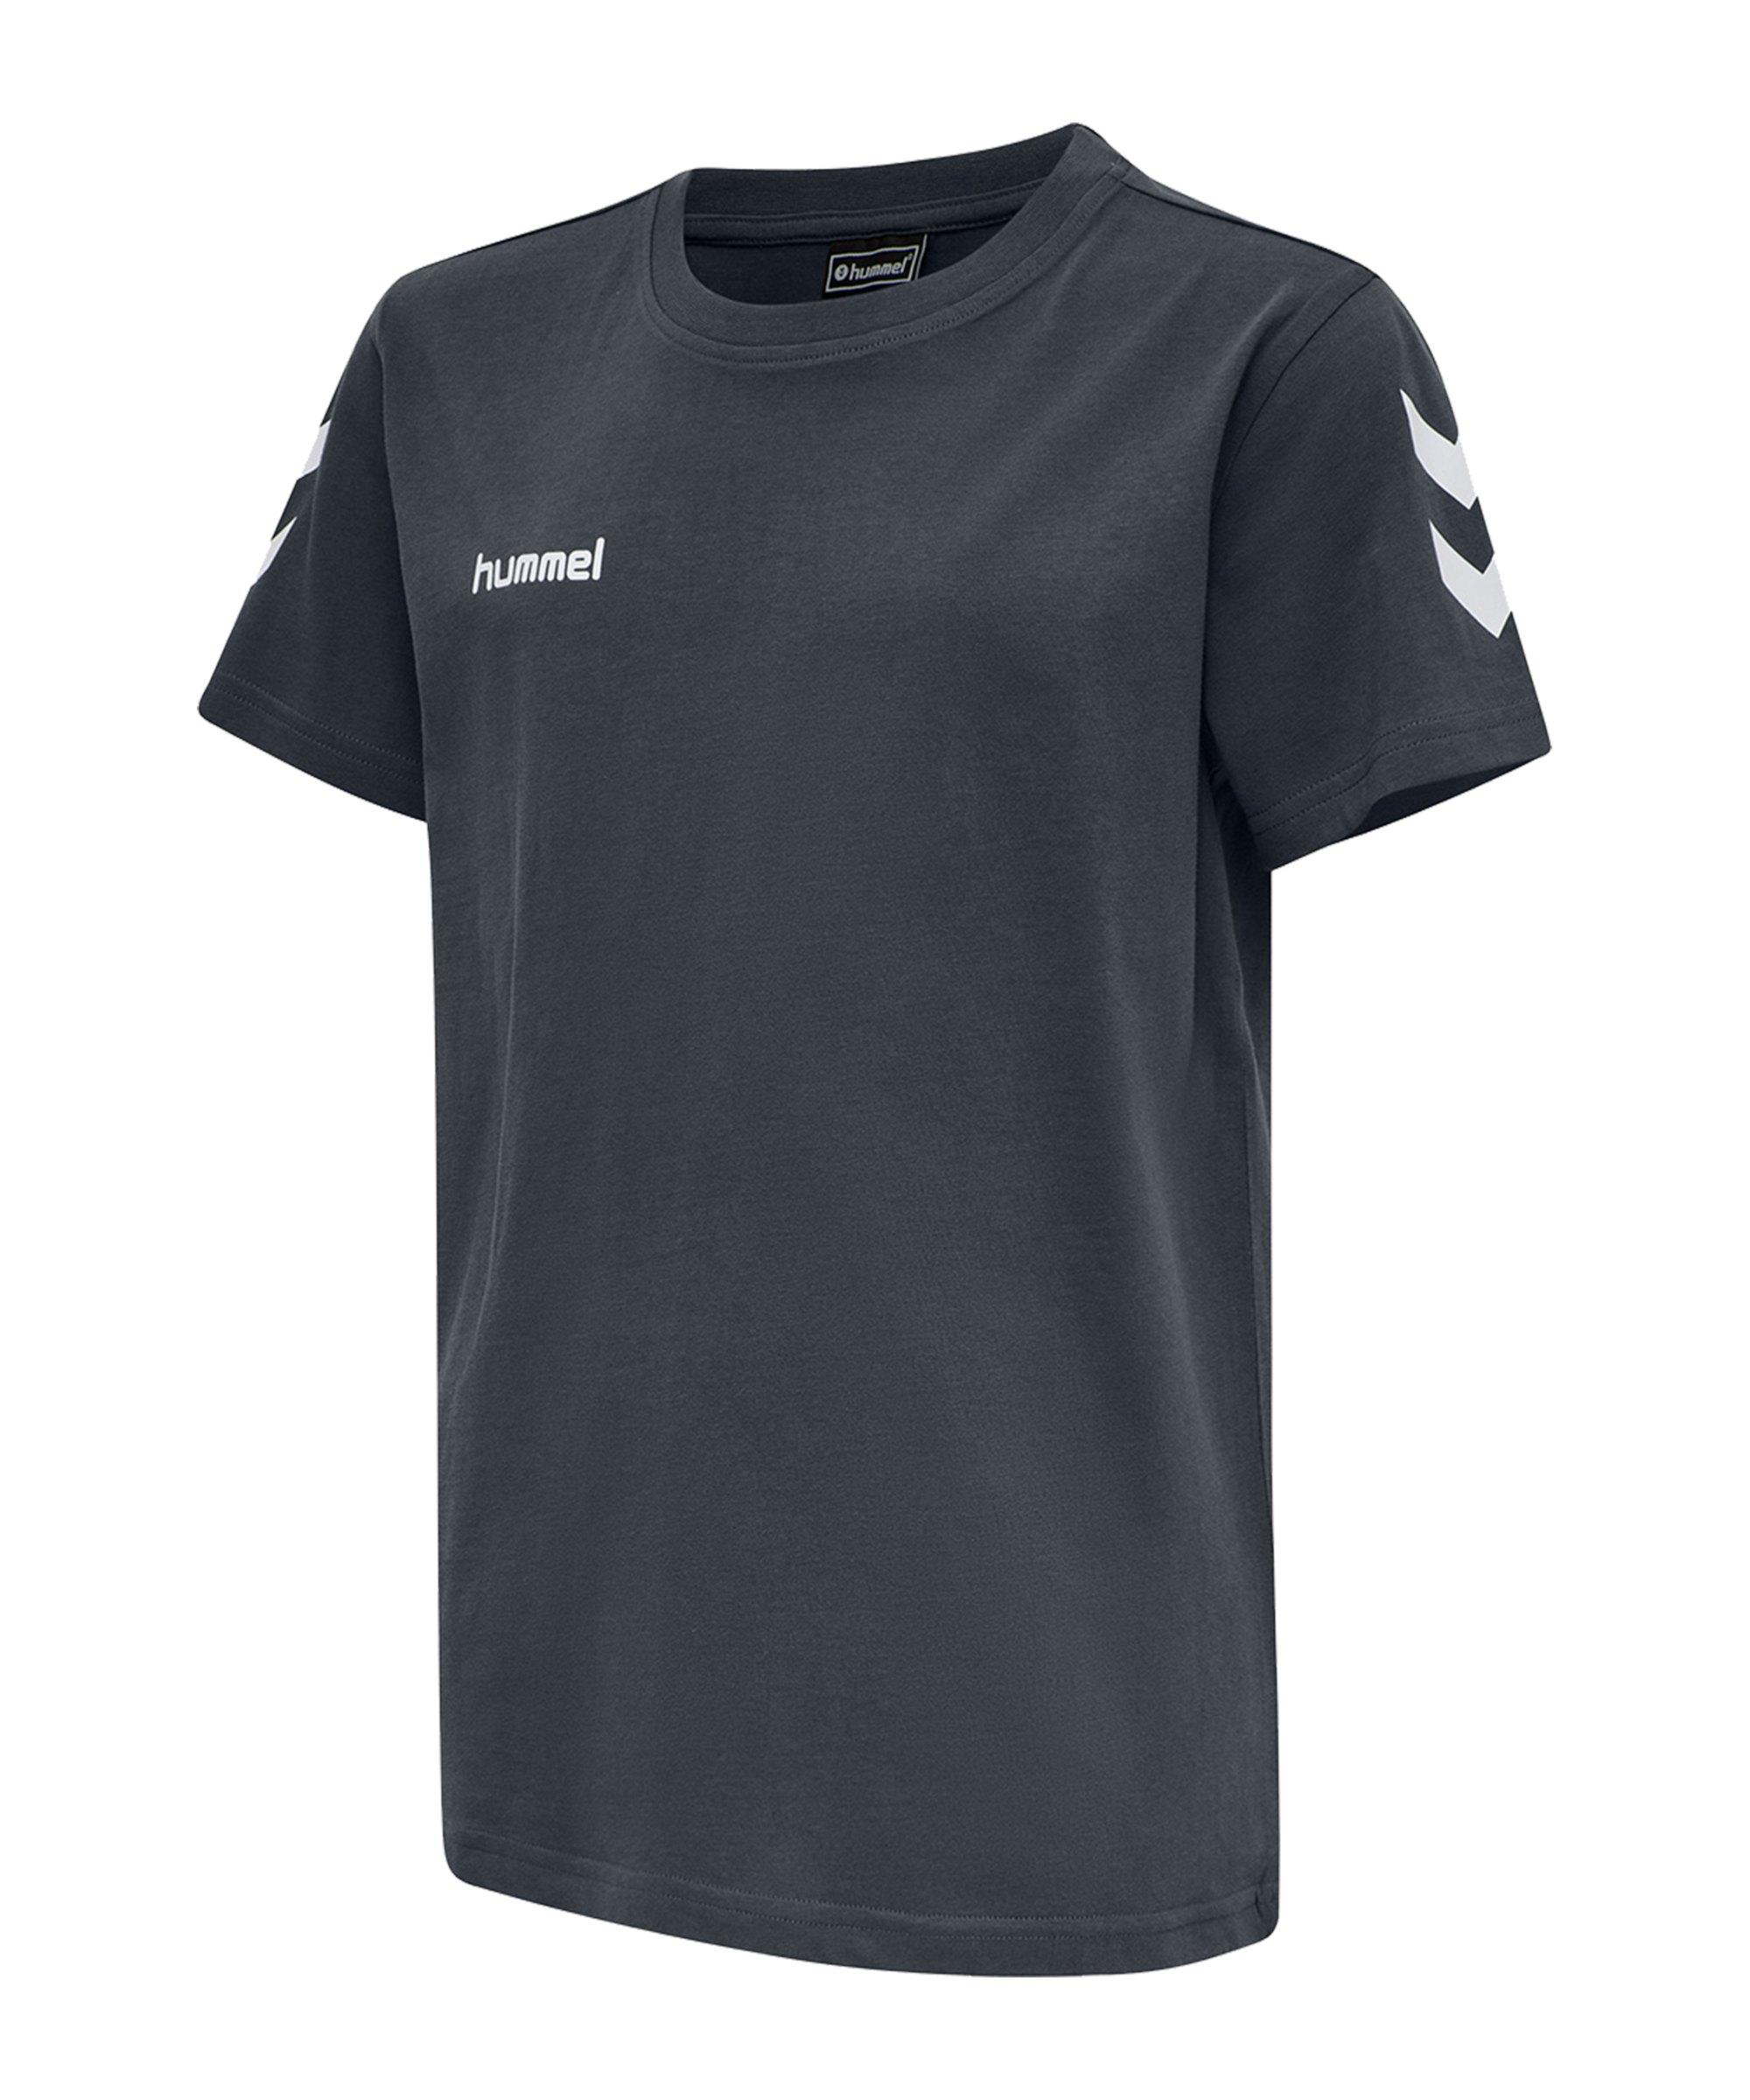 Hummel Cotton T-Shirt Kids Grau F8571 - grau